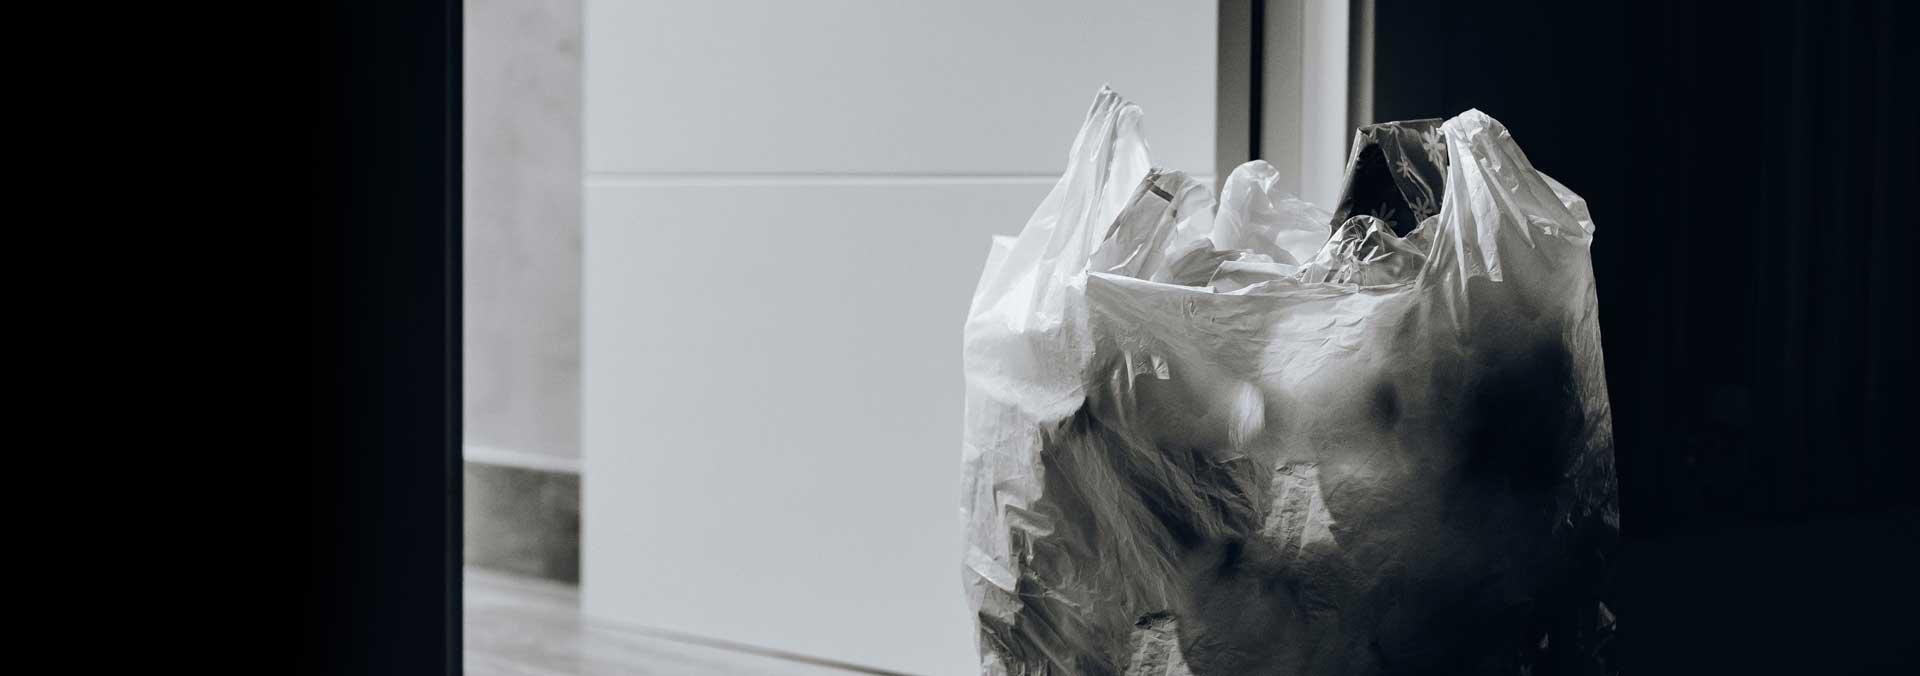 Bolsas para residuos, Plásticos JM srl